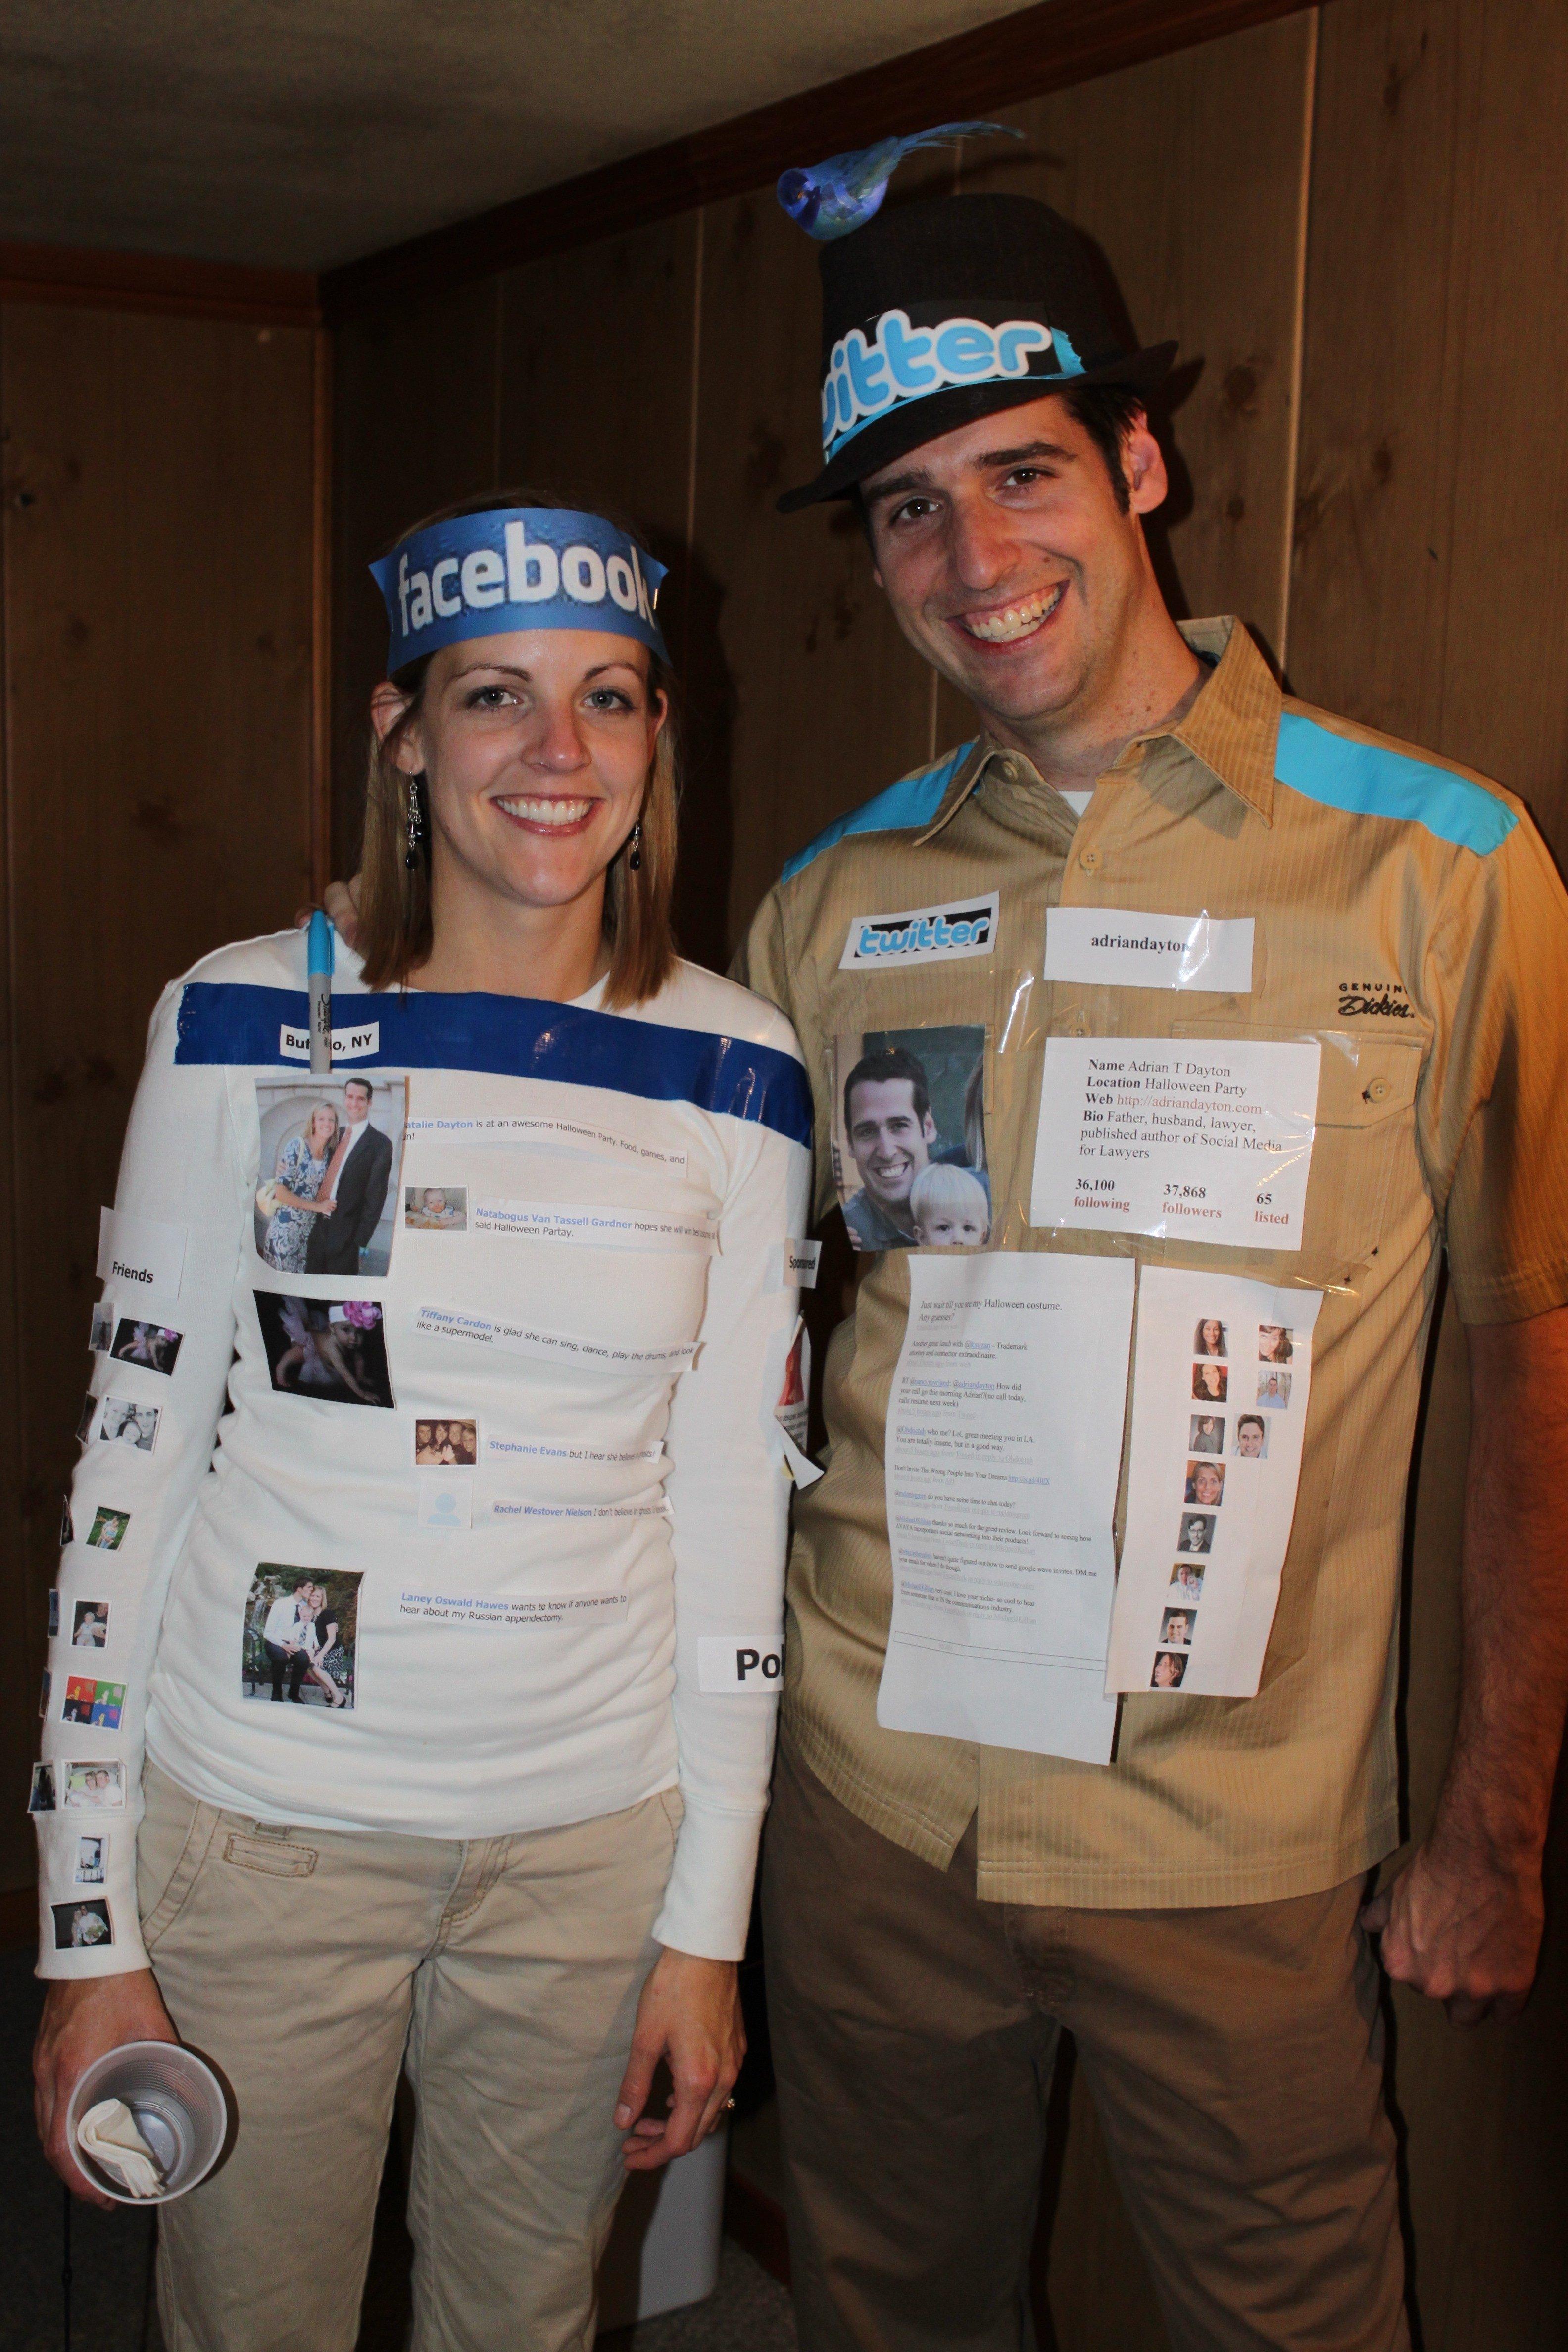 10 Gorgeous Couples Halloween Costumes Ideas Unique the social media couple costume 17 2020